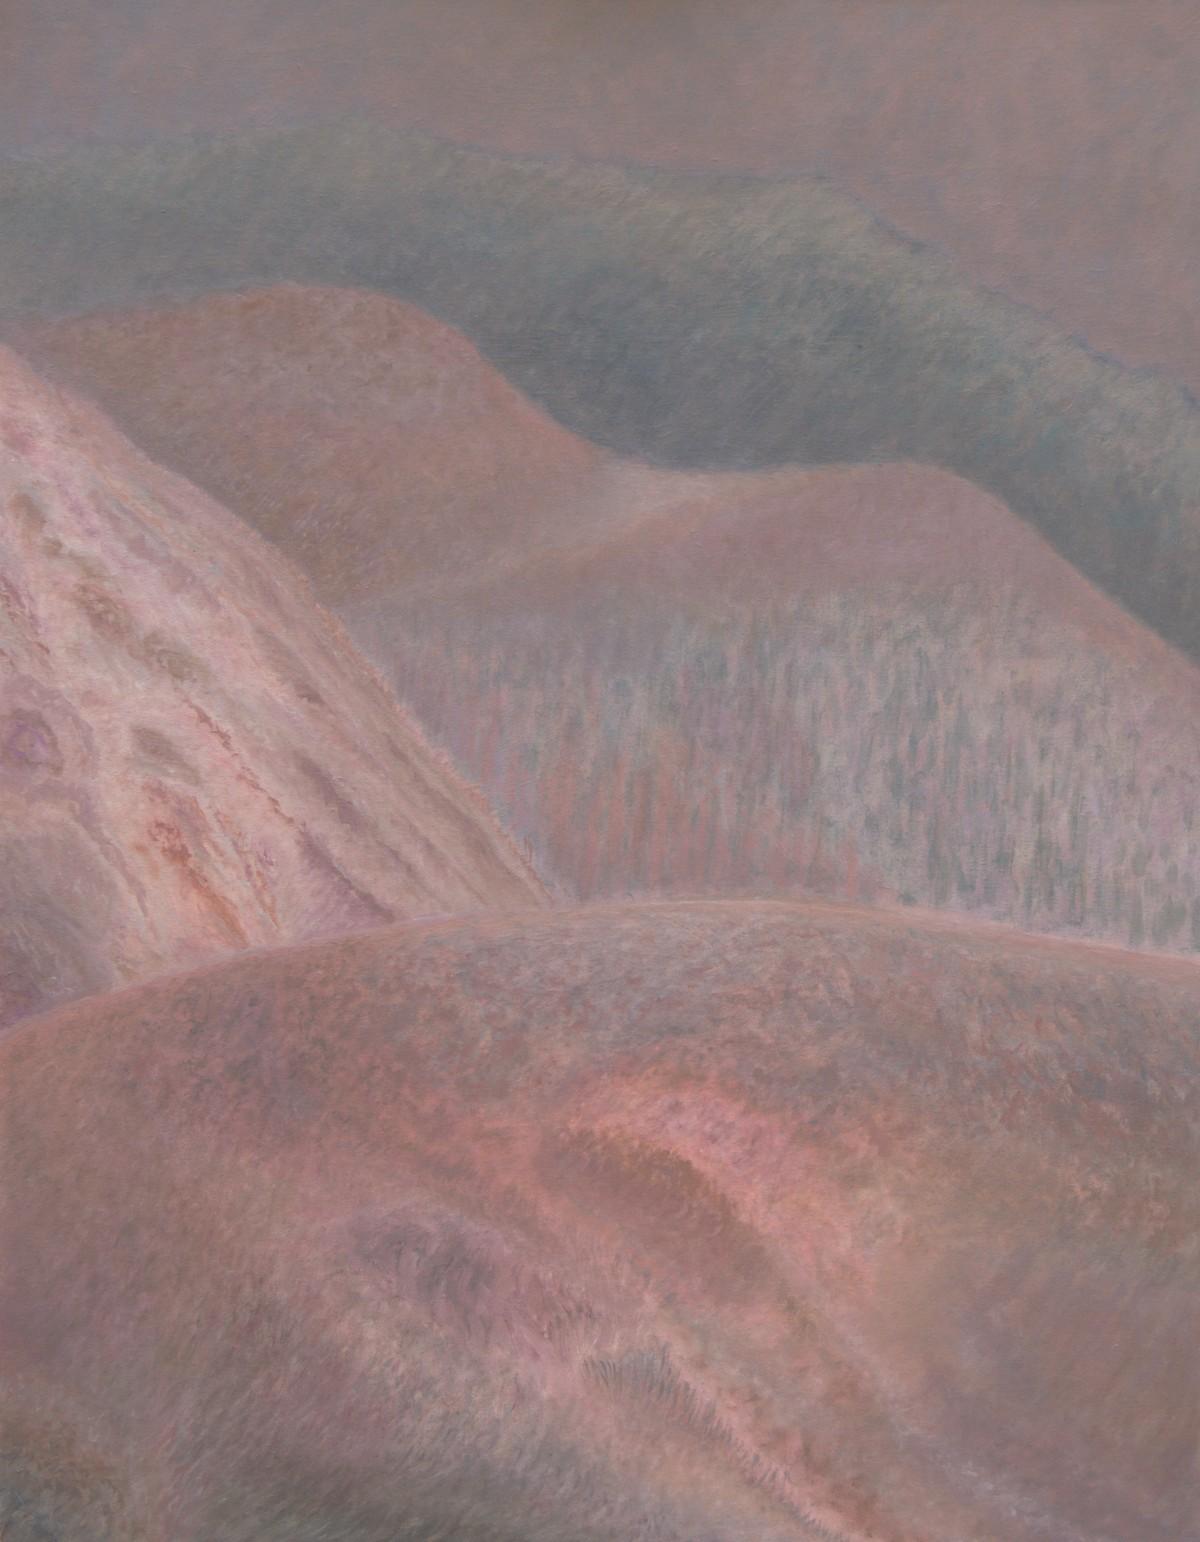 9 (oil on canvas, 70x90 cm), 2008-16